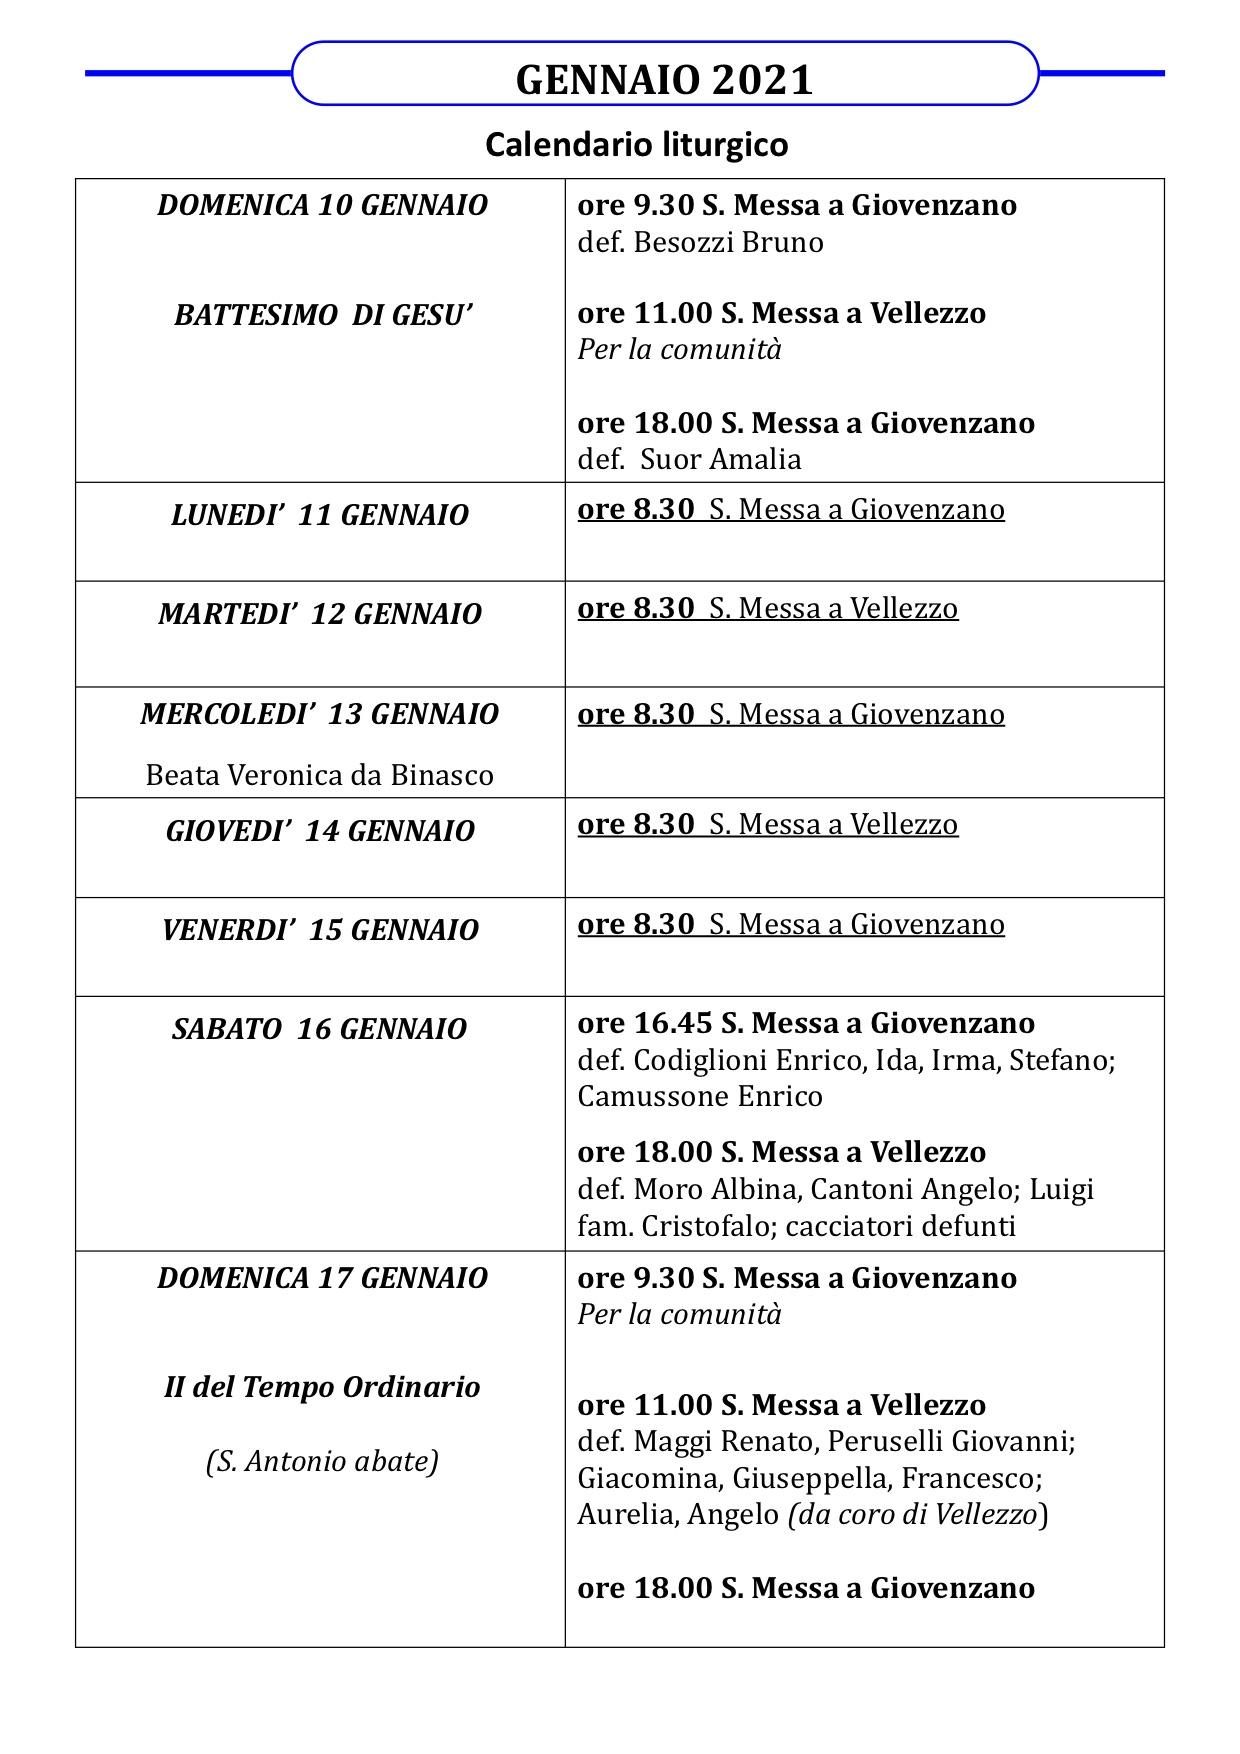 Calendario liturgico dal 10 al 17 gennaio 2021